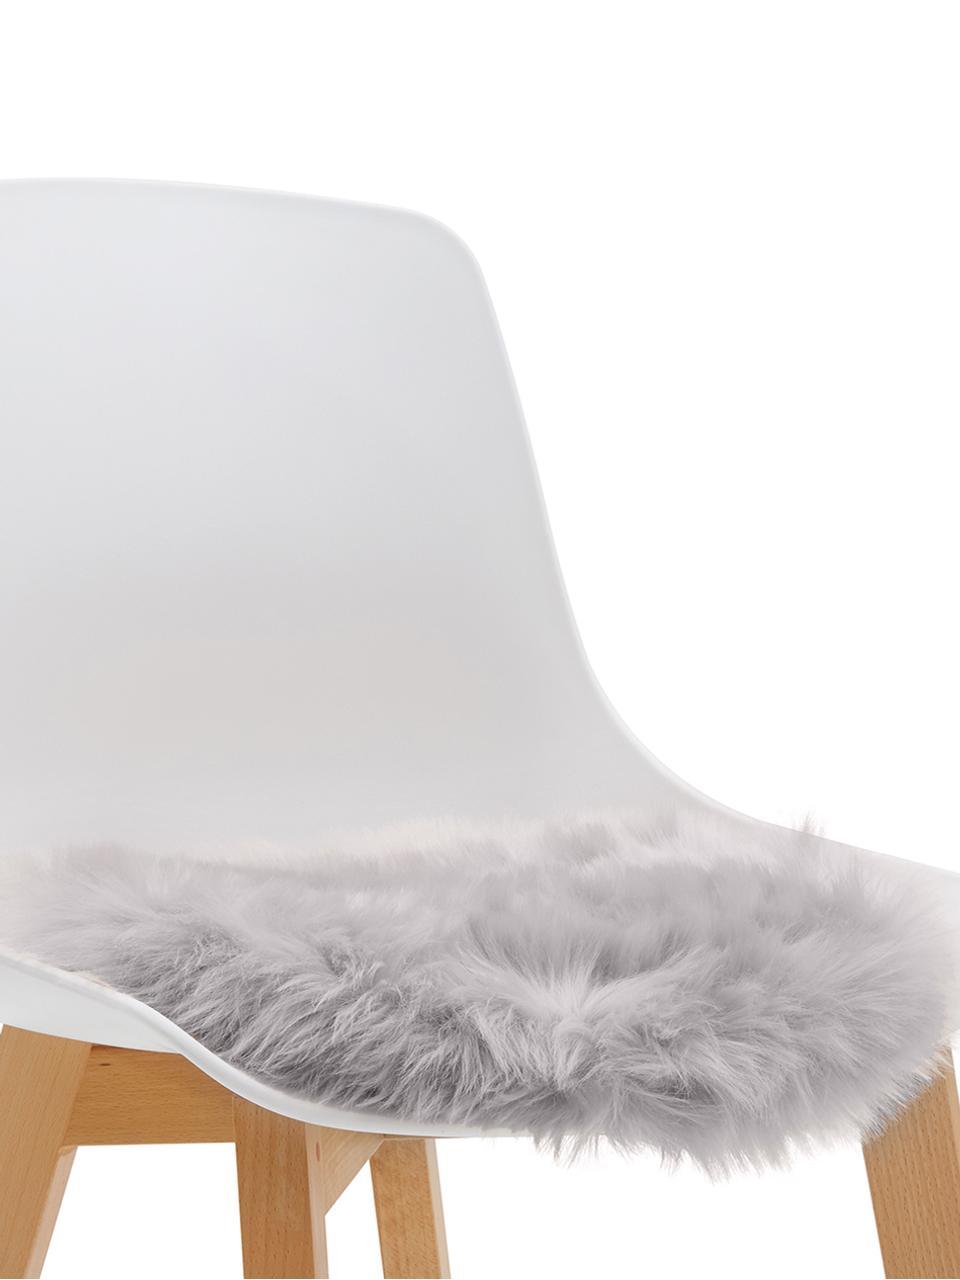 Kunstfell-Sitzauflage Mathilde, glatt, Vorderseite: 65% Akryl, 35% Polyester, Rückseite: 100% Polyester, Hellgrau, Ø 37 cm